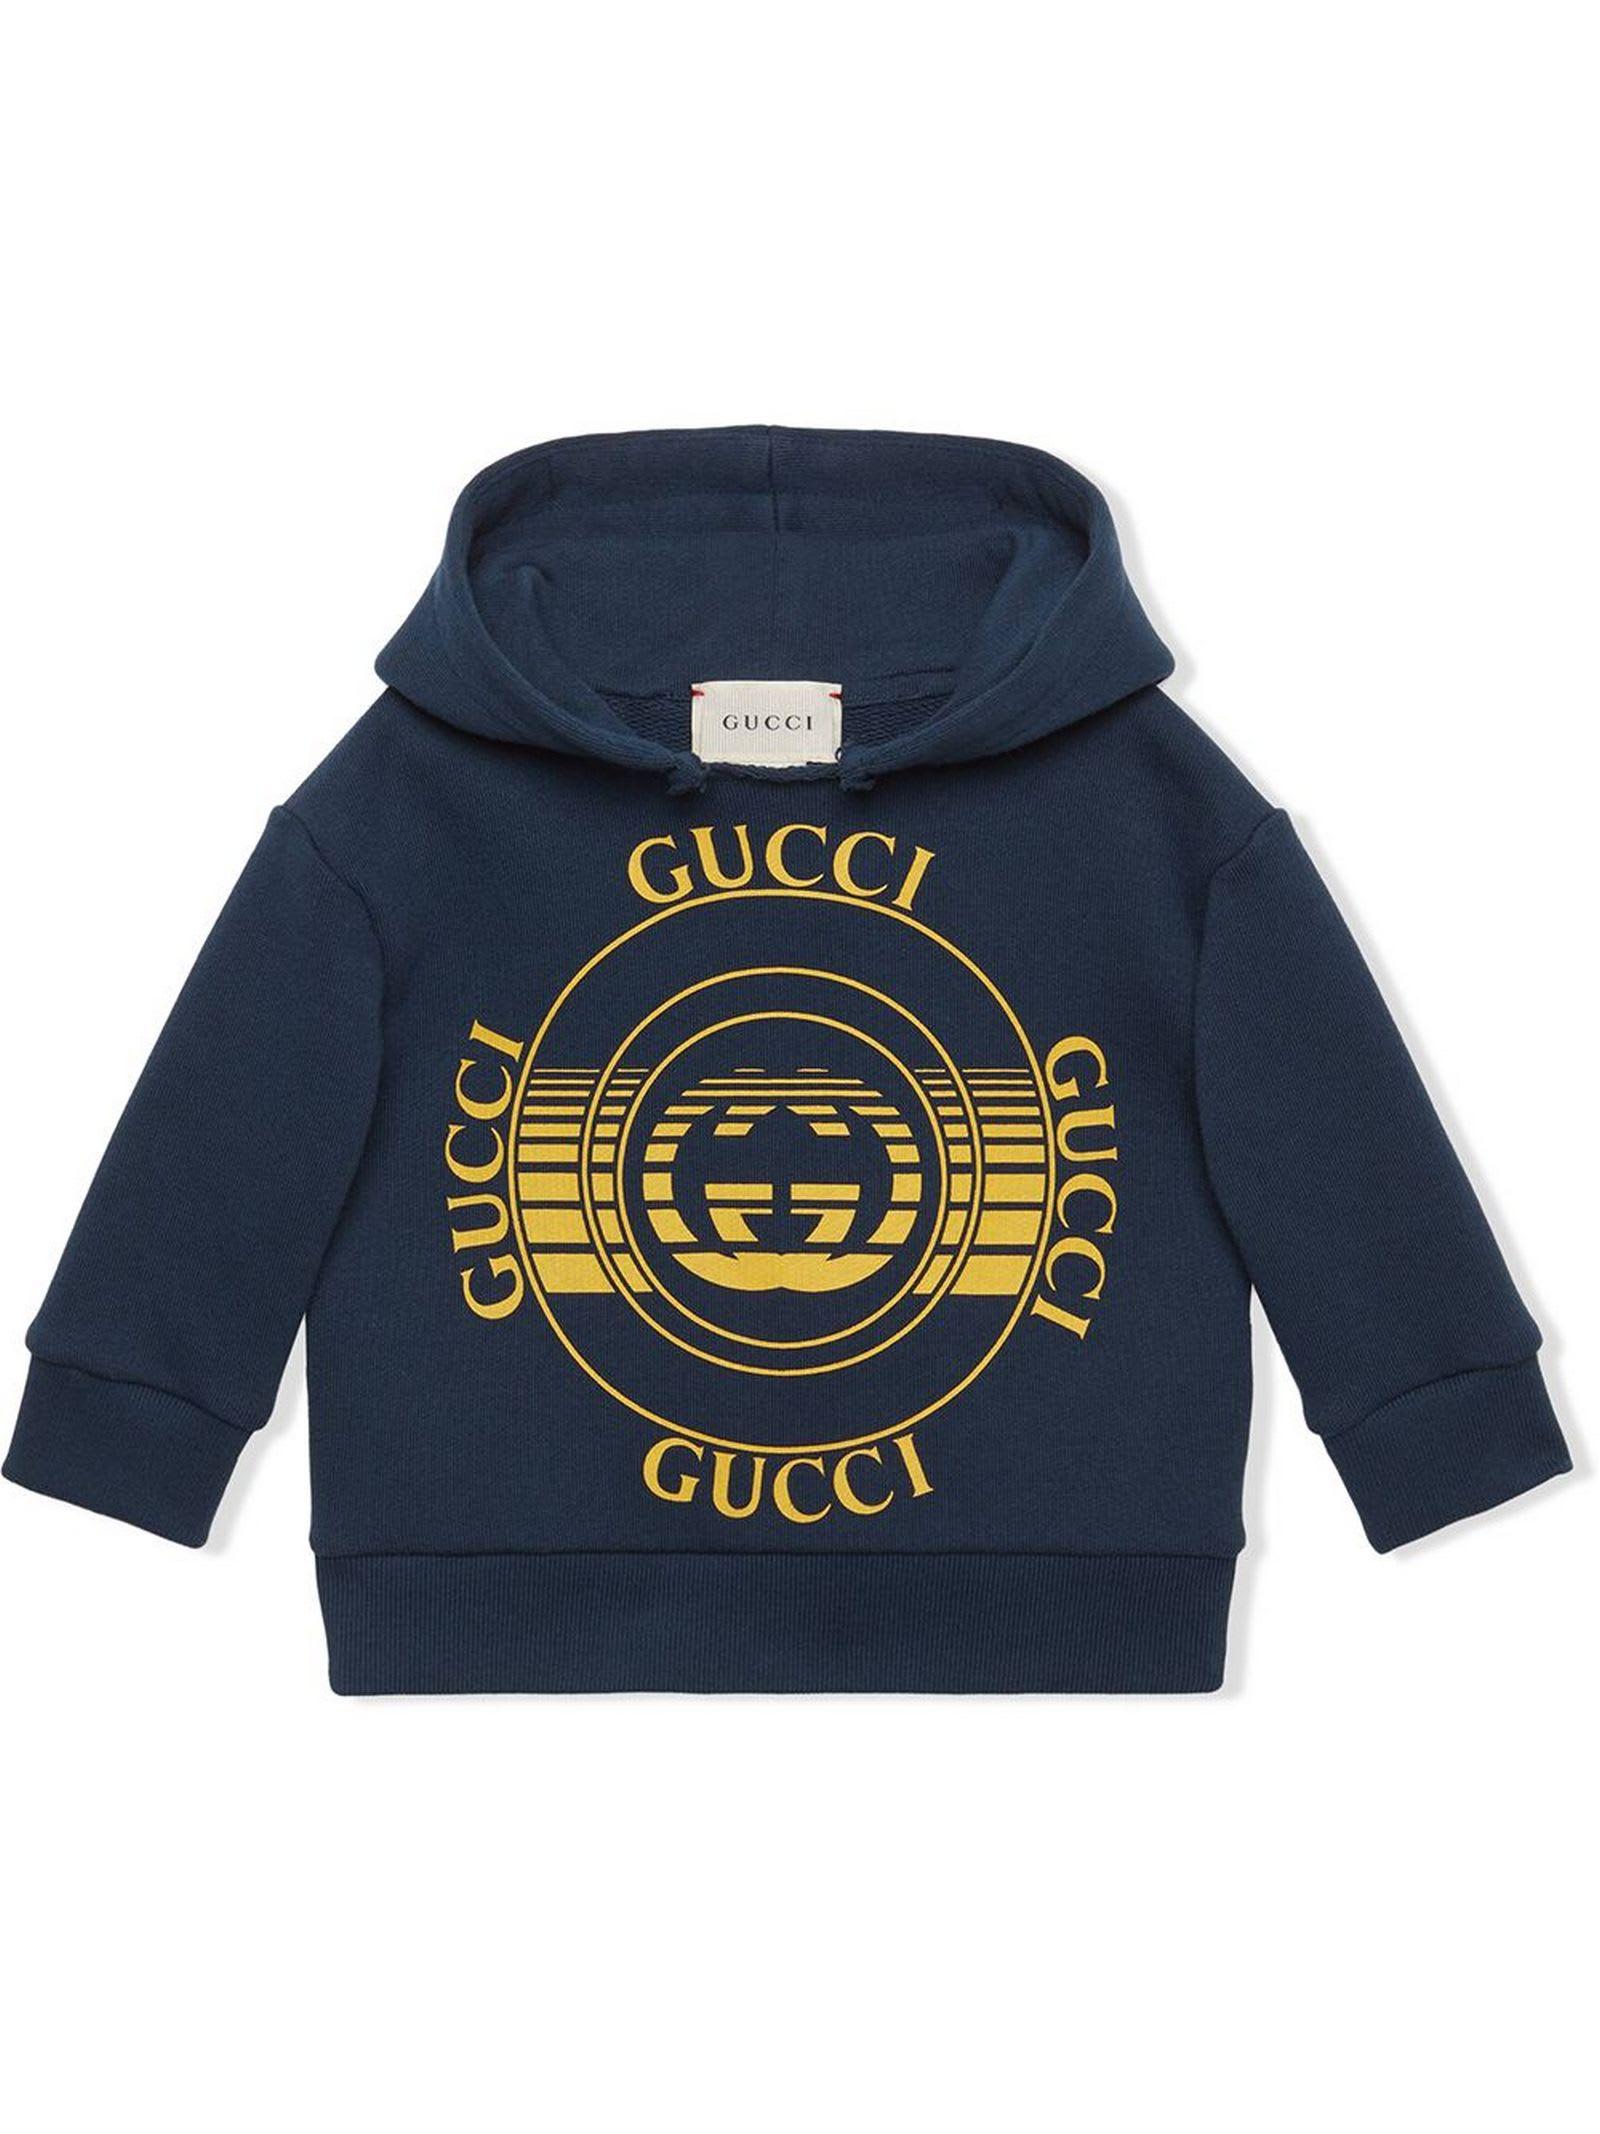 Gucci Cottons DISK PRINT SWEATSHIRT